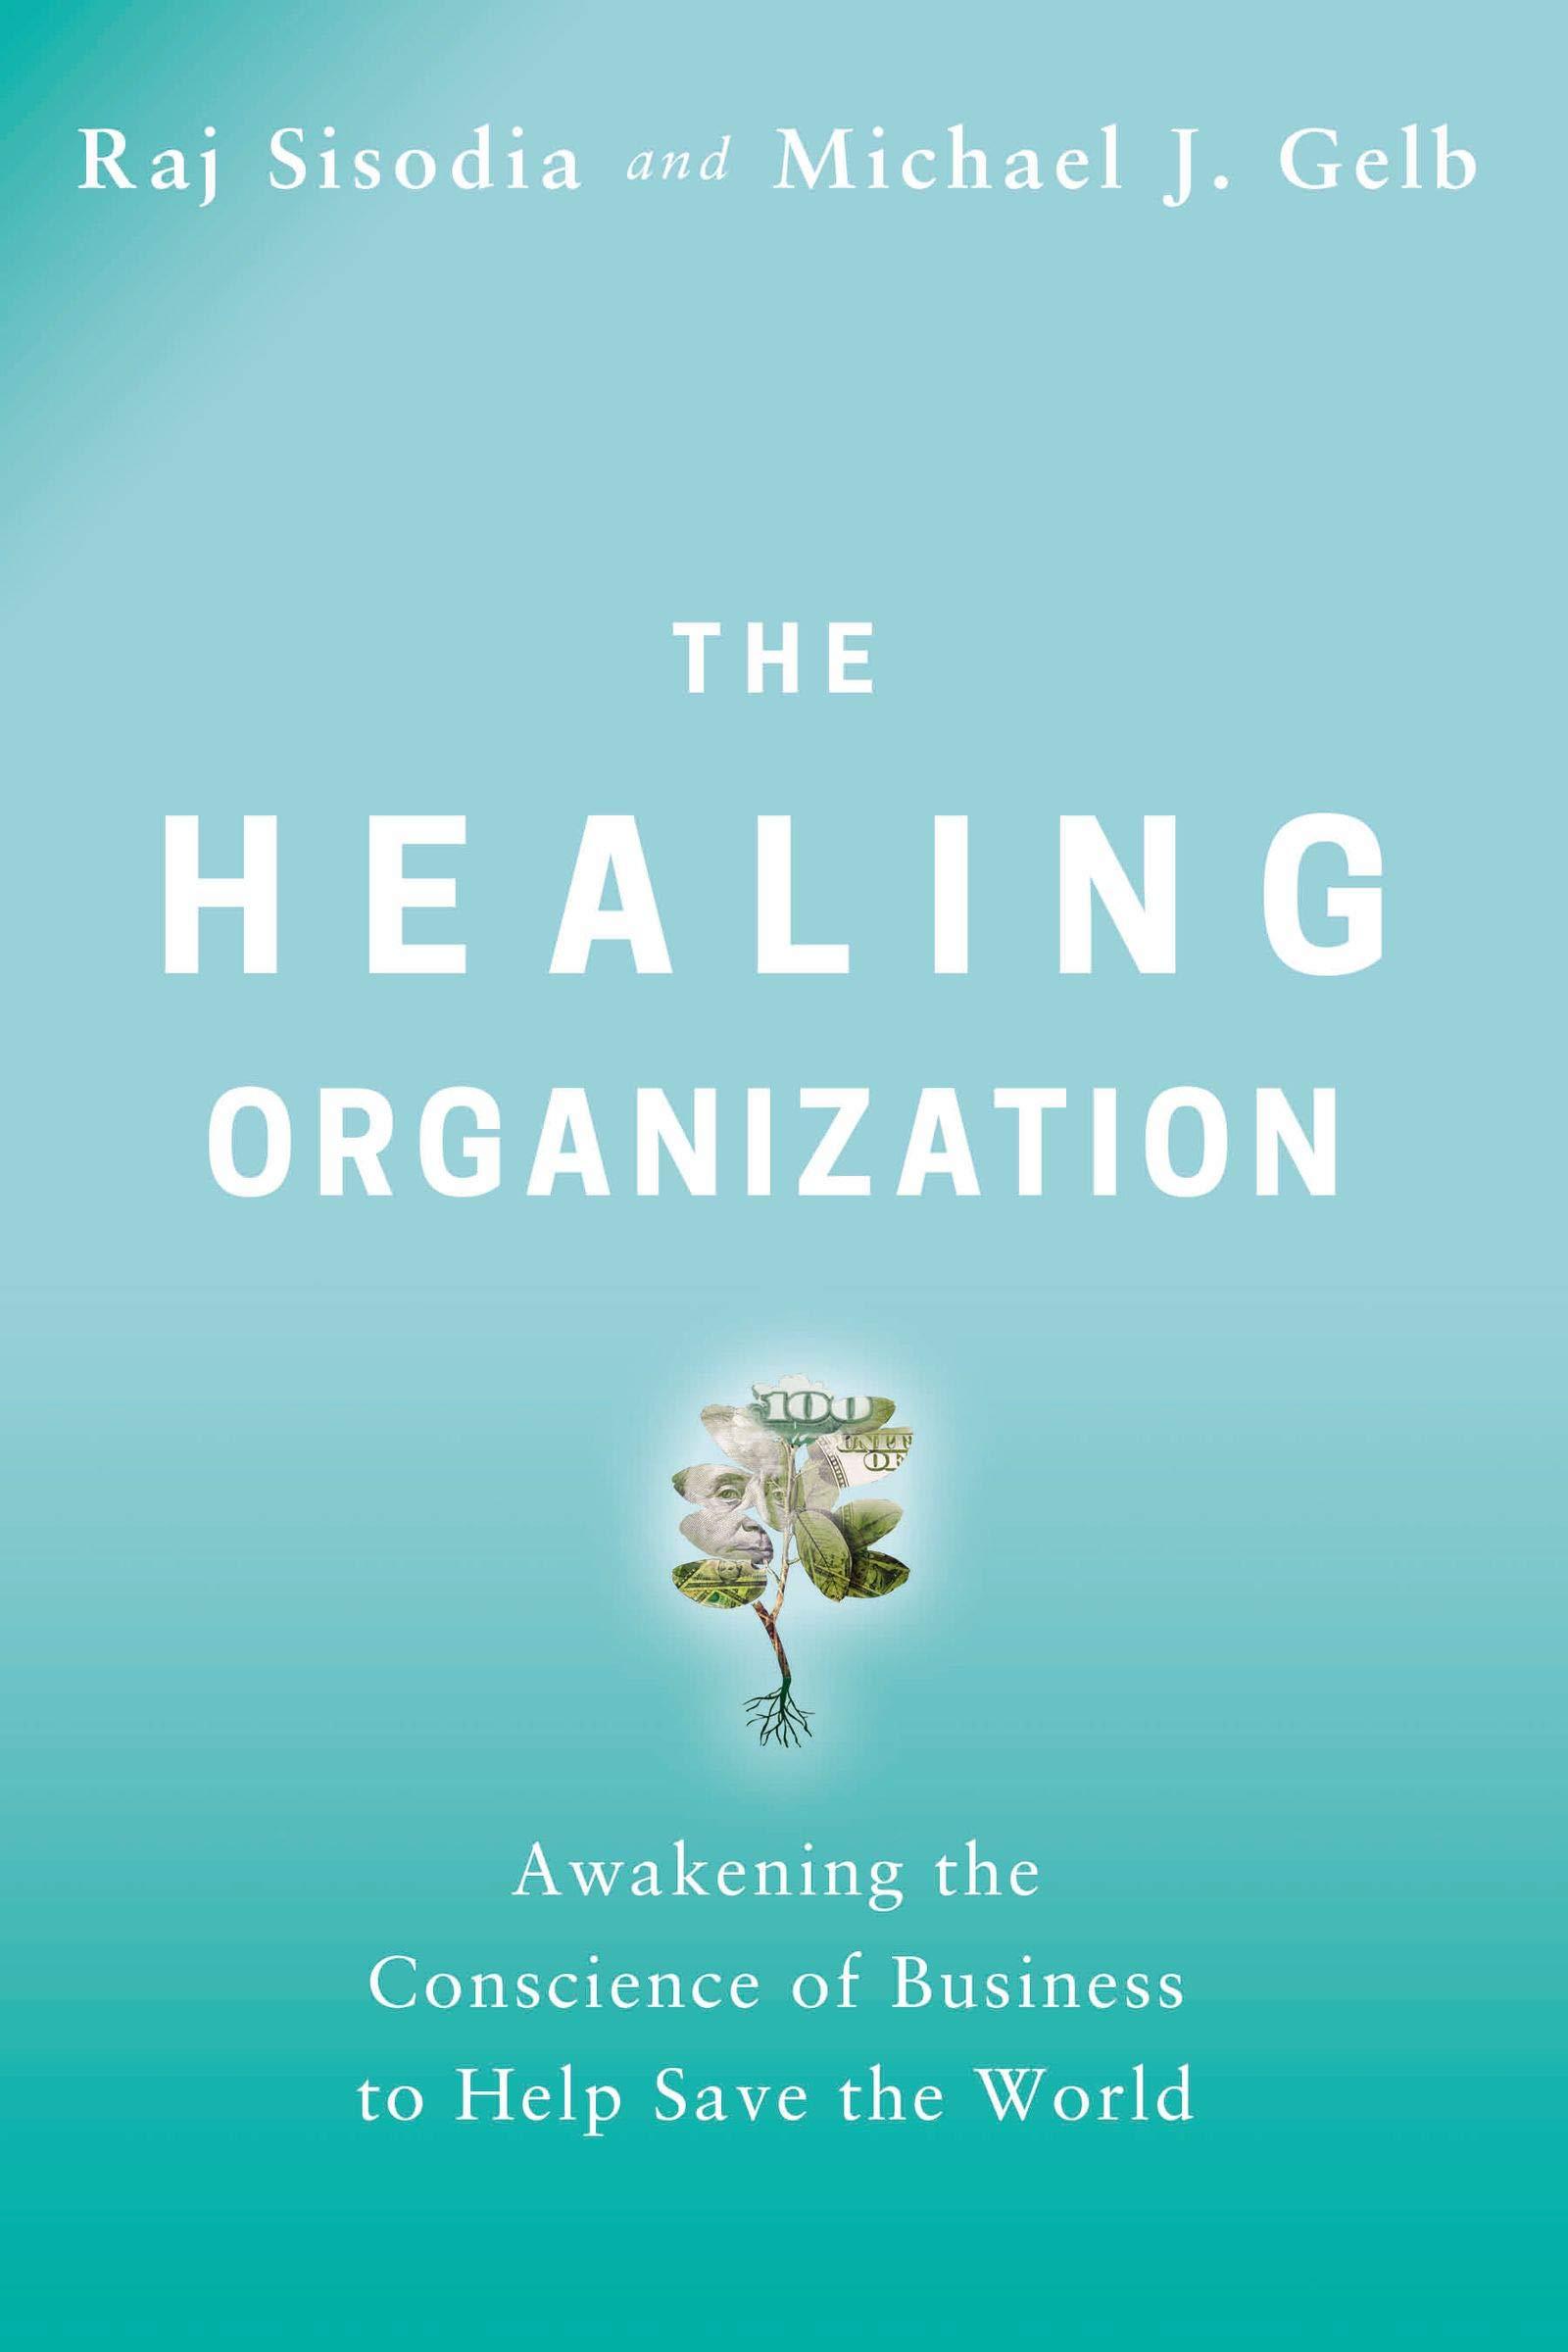 The Healing Organization.